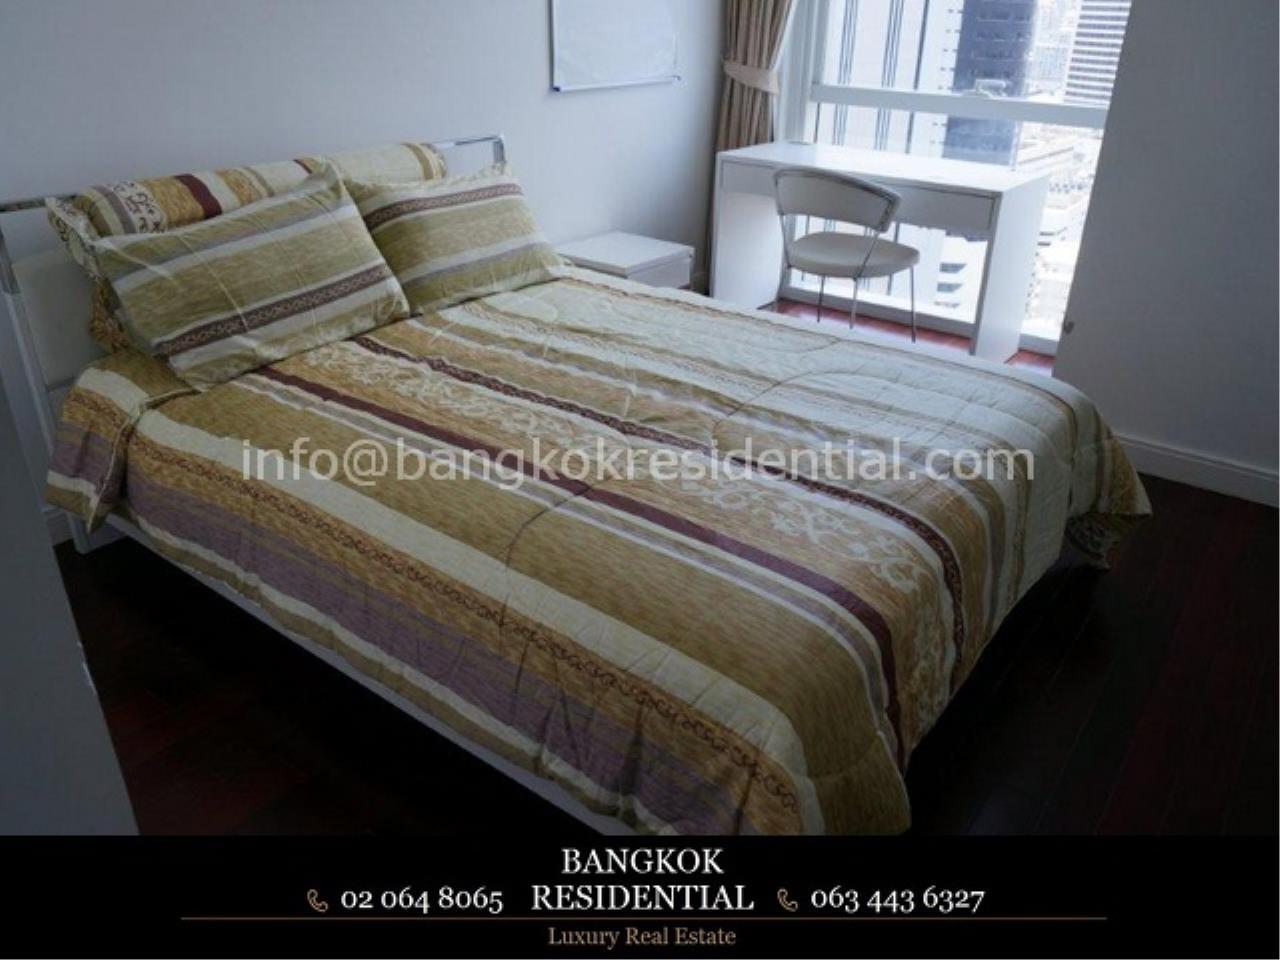 Bangkok Residential Agency's 3BR Athenee Residence For Sale Or Rent (BR3386CD) 10